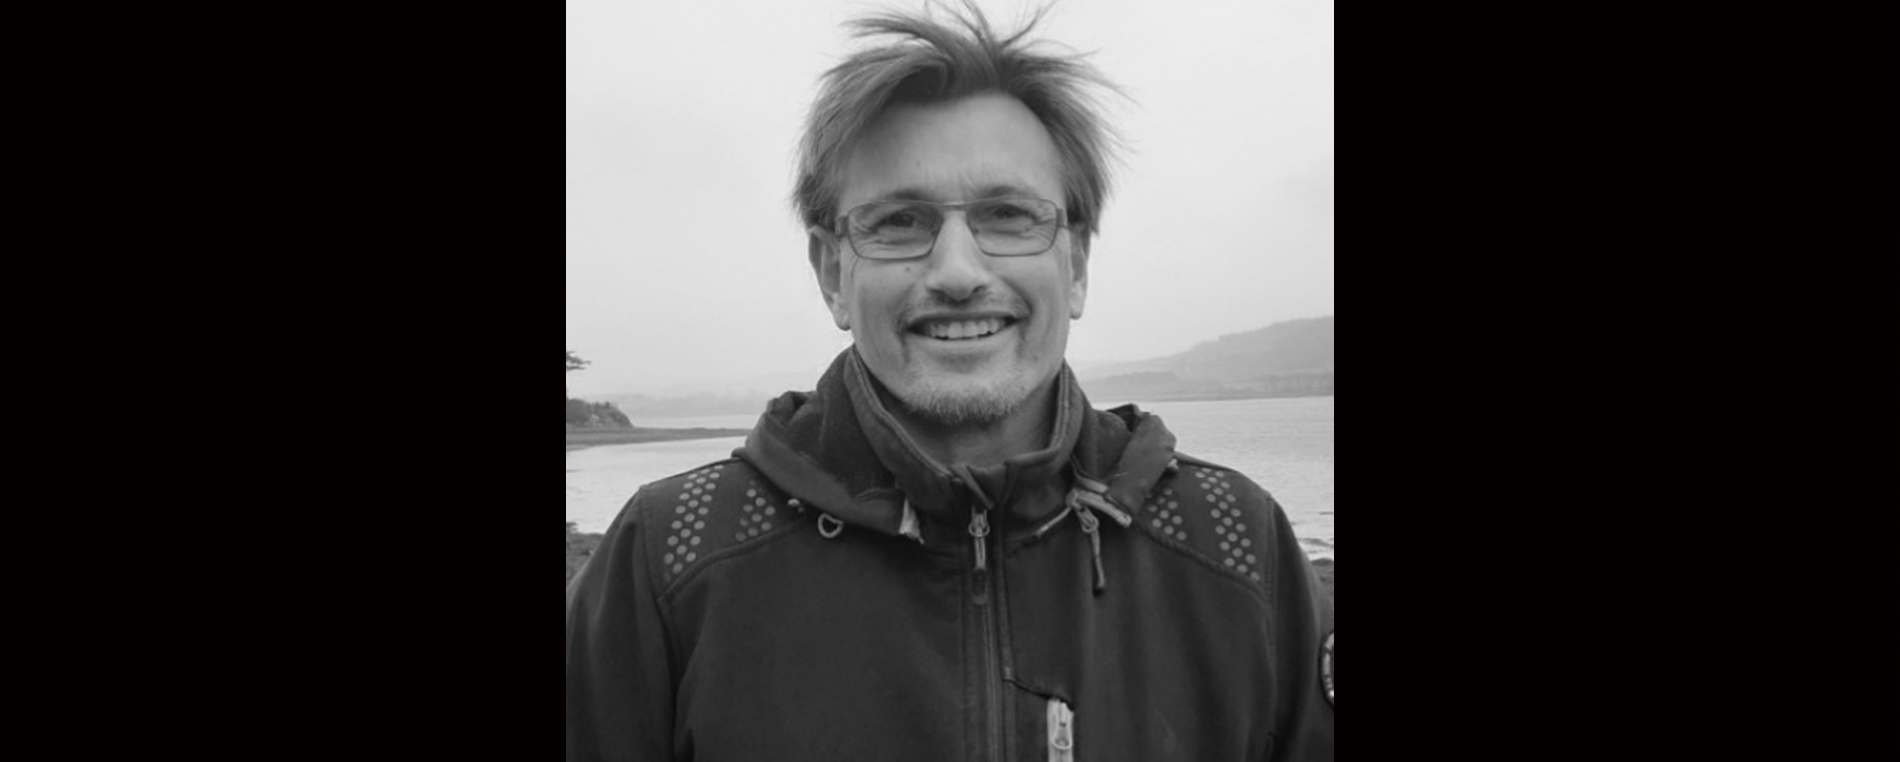 Johan Prat, Foil Fun Ocean Drone